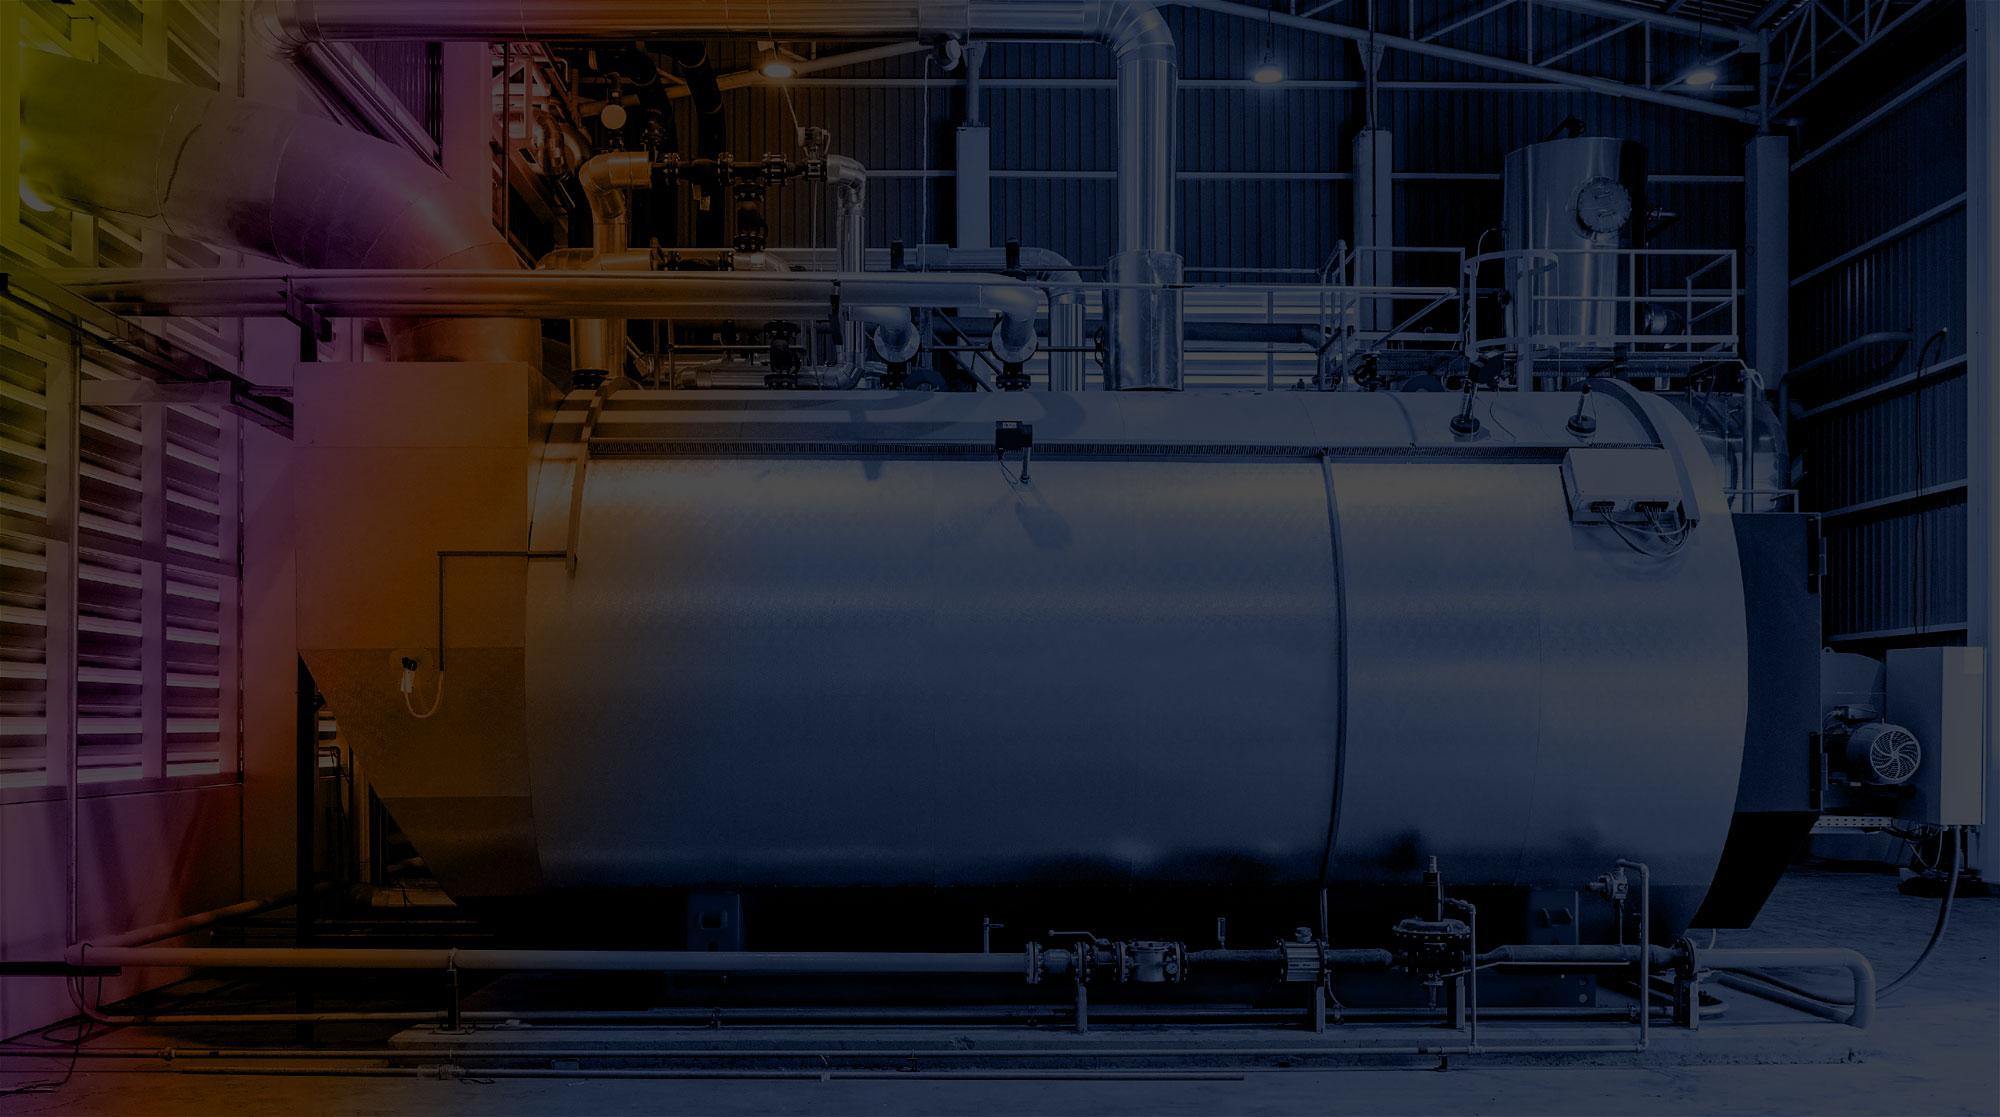 Energy Construction Services Inc. boiler rental slide